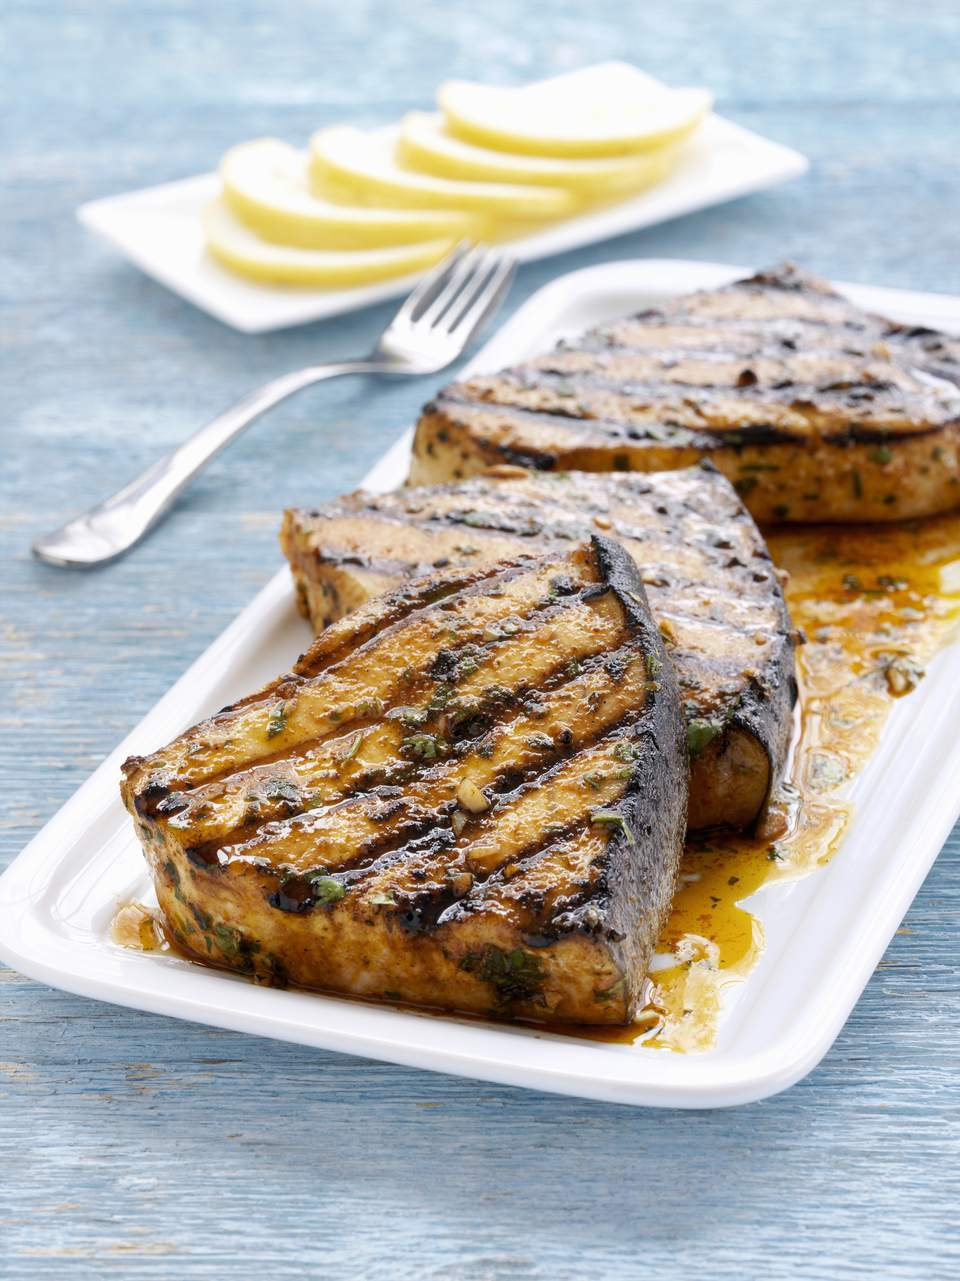 Grilled swordfish steaks, close up